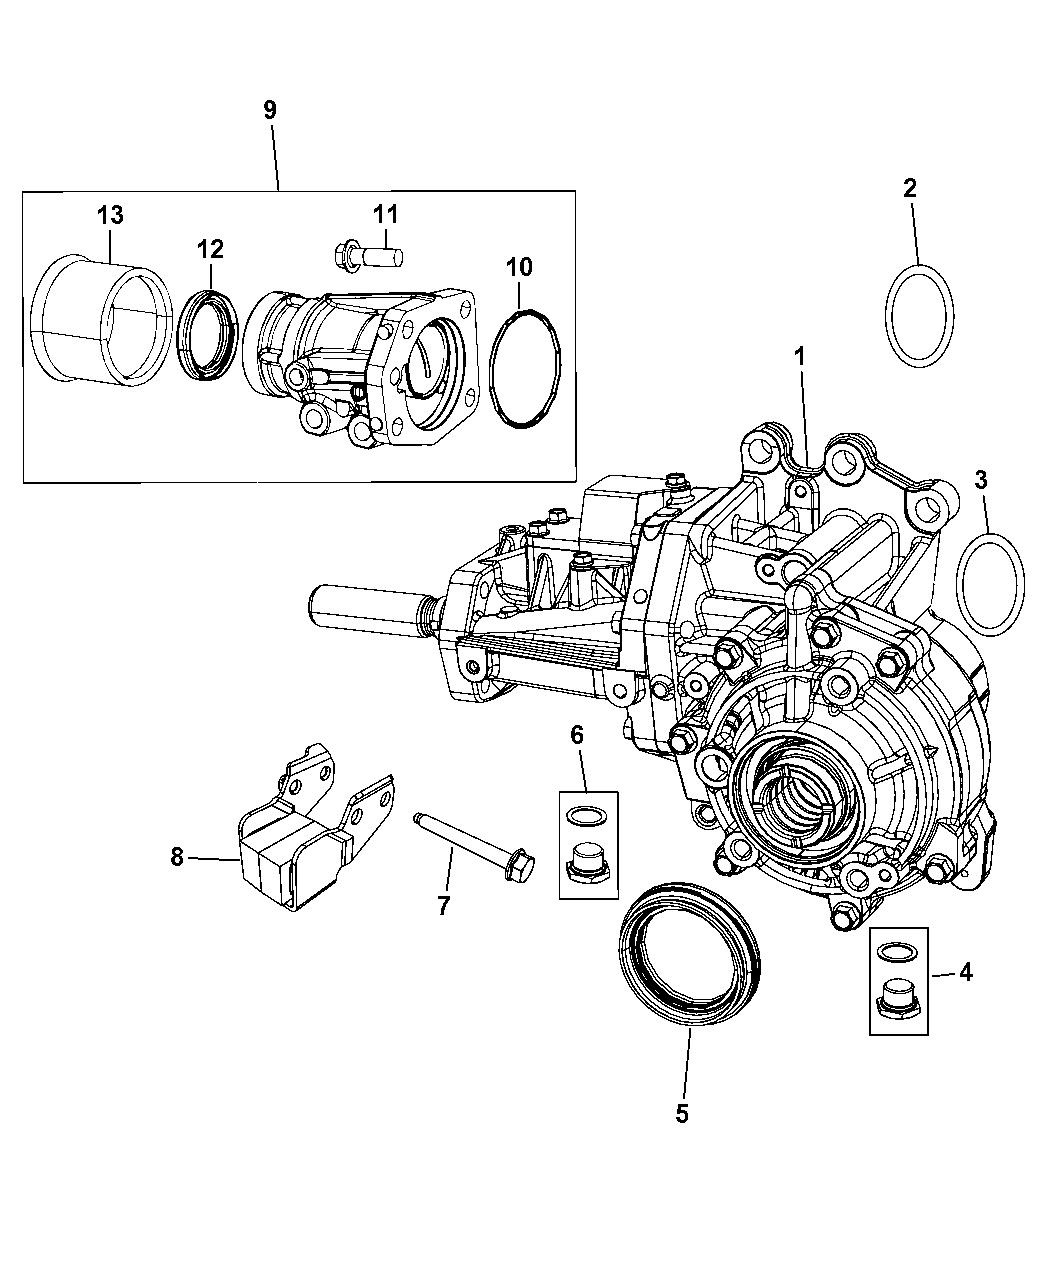 2008 Jeep Patriot Power Transfer Unit Assembly